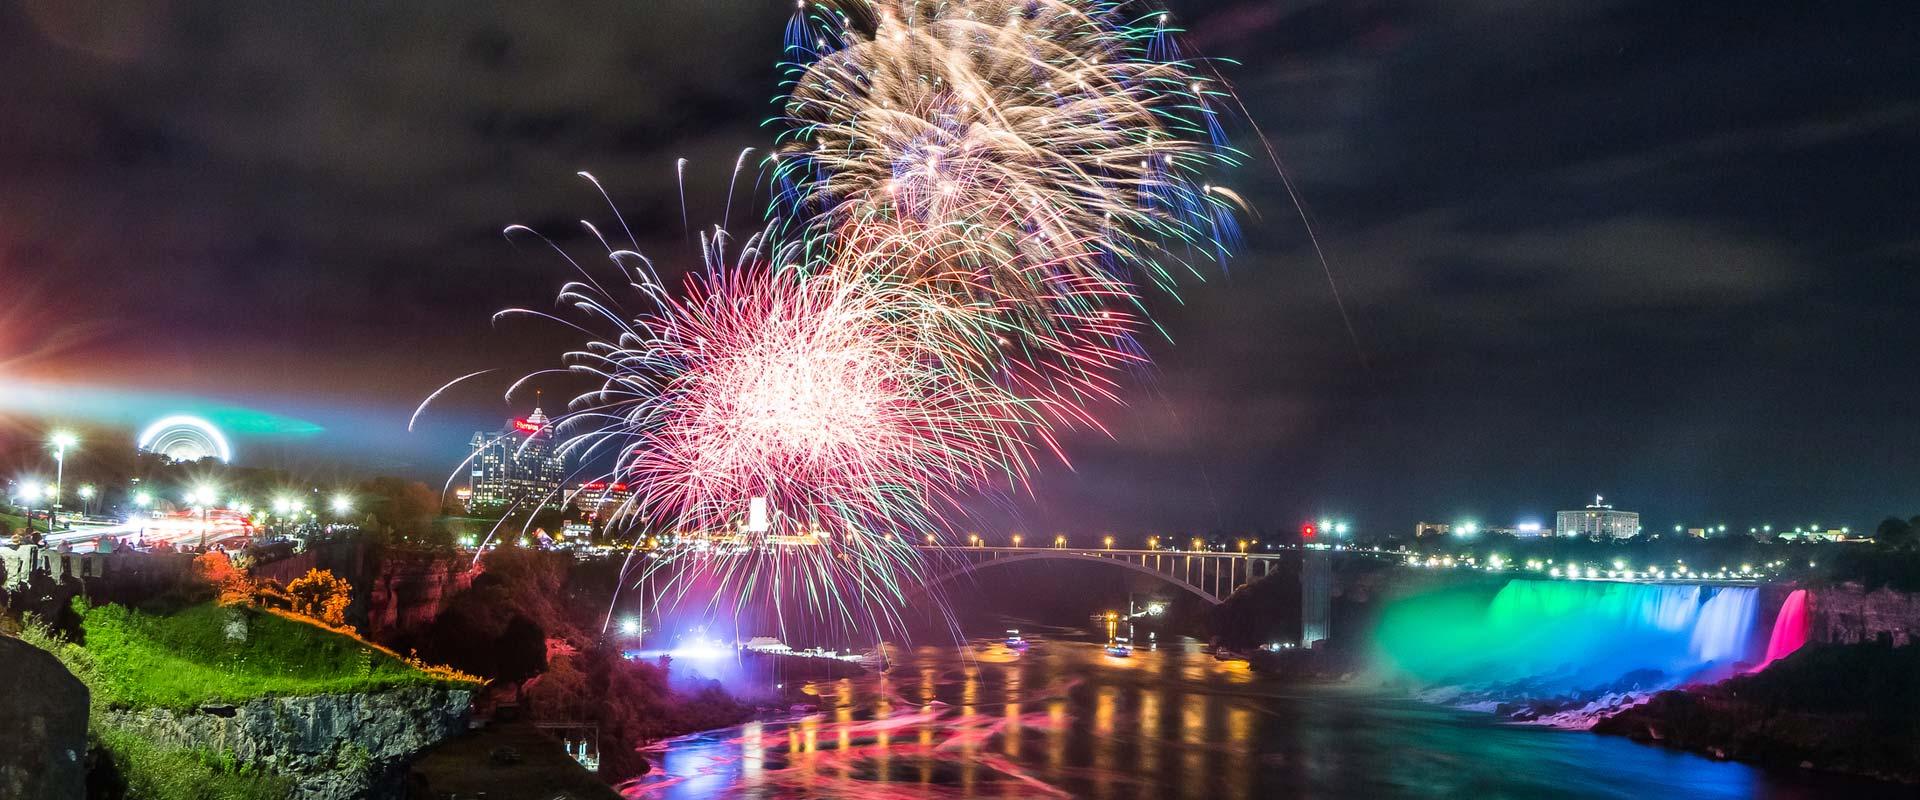 Fireworks Over The Falls Winter Festival Of Lights